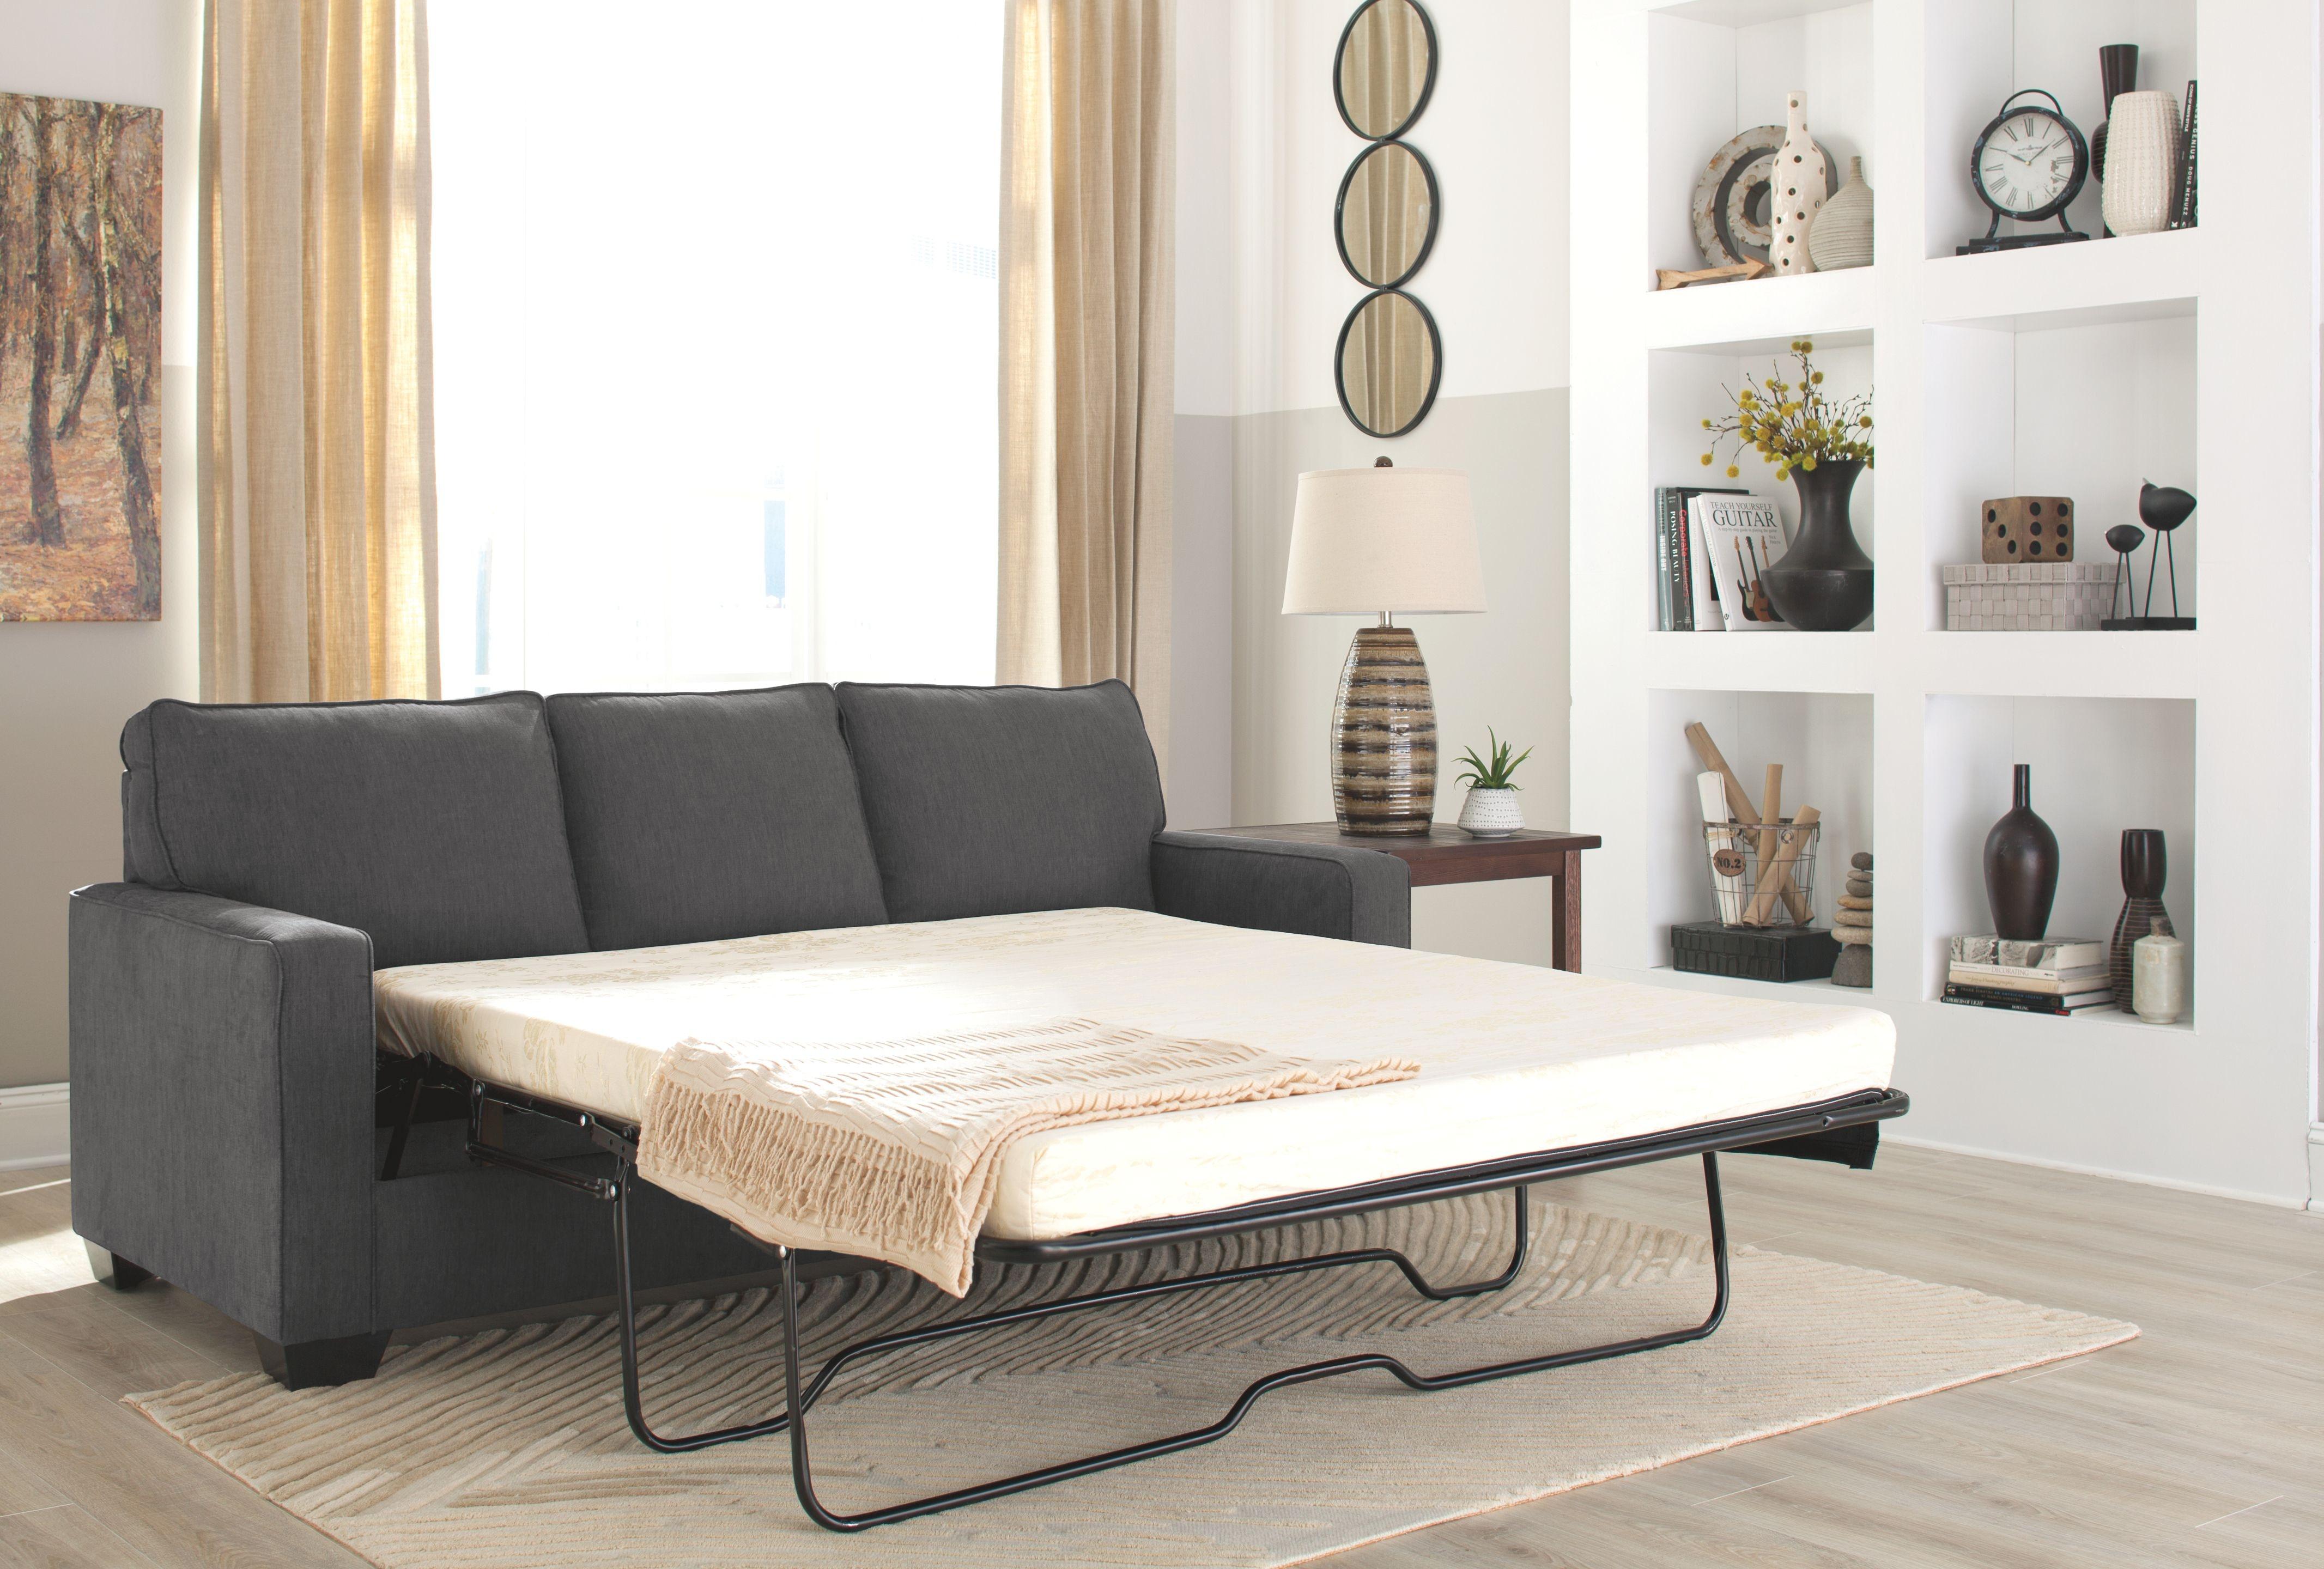 Superieur Signature Design By Ashley Queen Sofa Sleeper 3590139